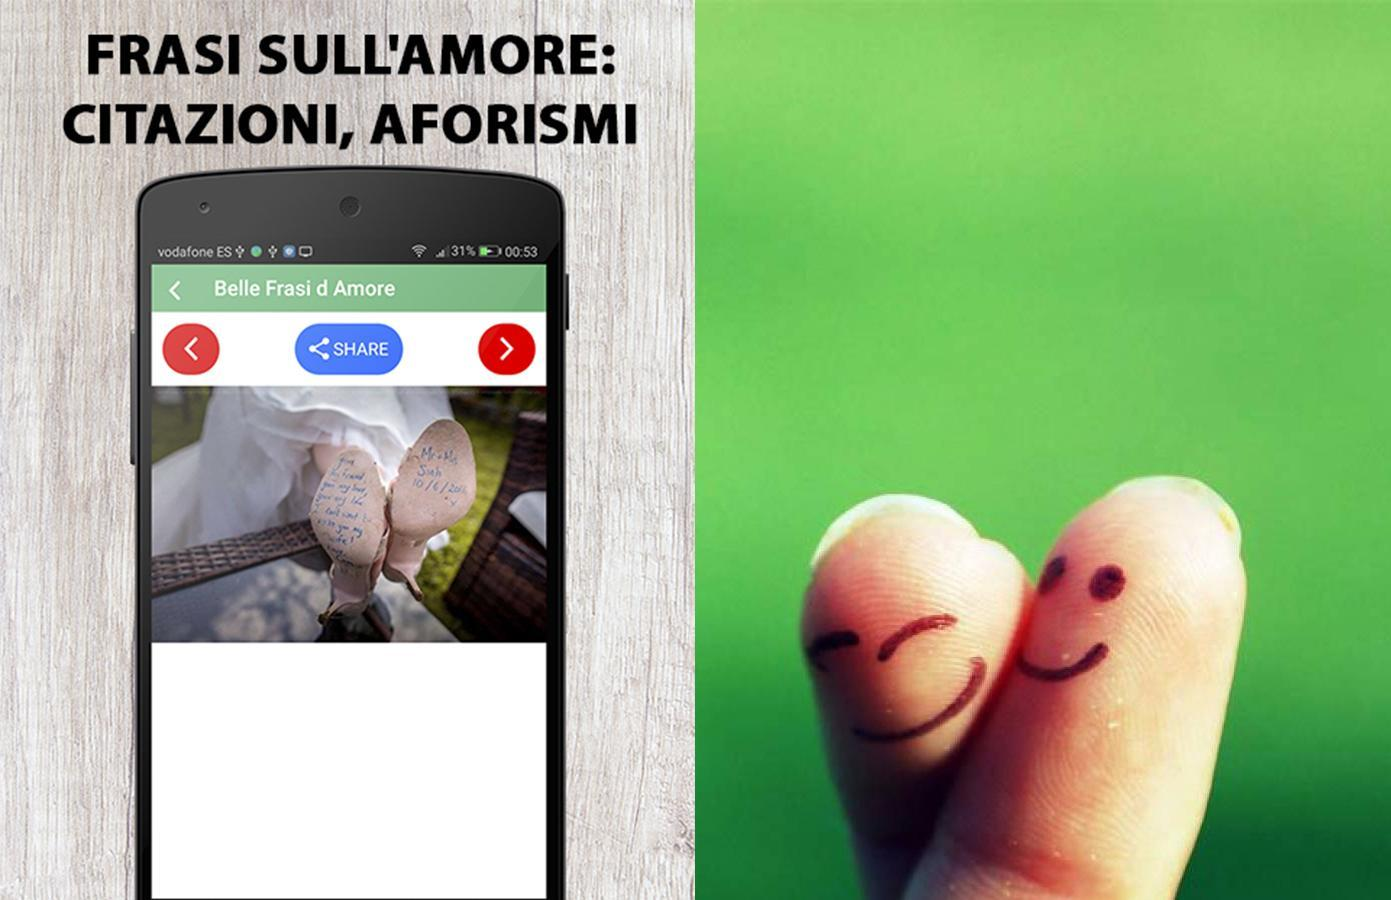 Belle Frasi D Amore For Android Apk Download